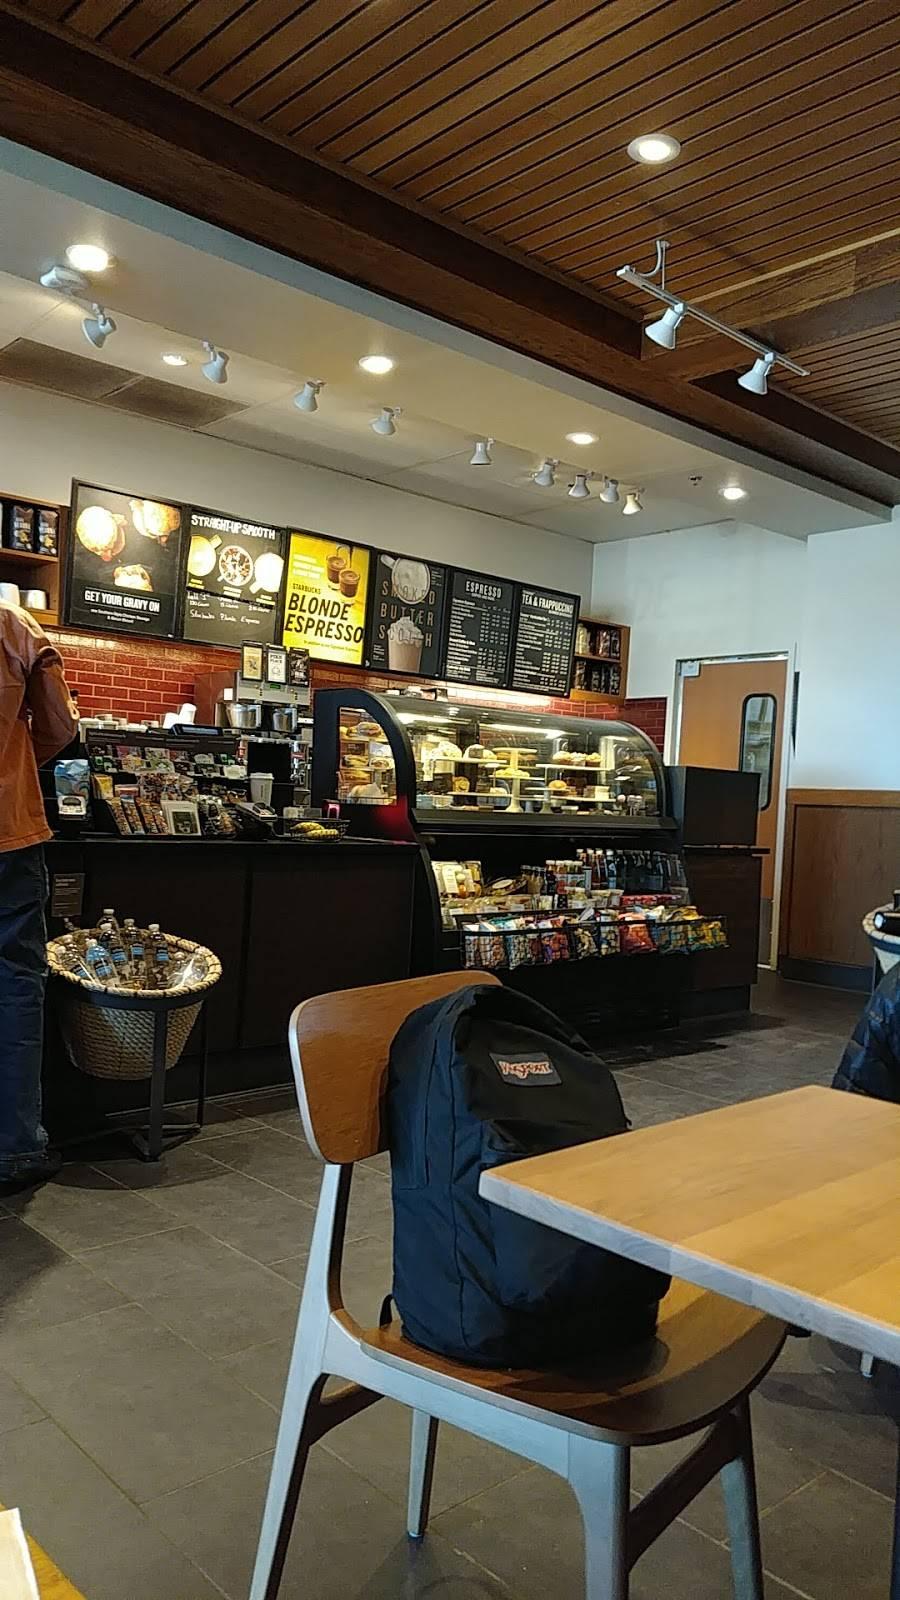 Starbucks   cafe   1205 W Dundee Rd, Buffalo Grove, IL 60089, USA   8473985216 OR +1 847-398-5216